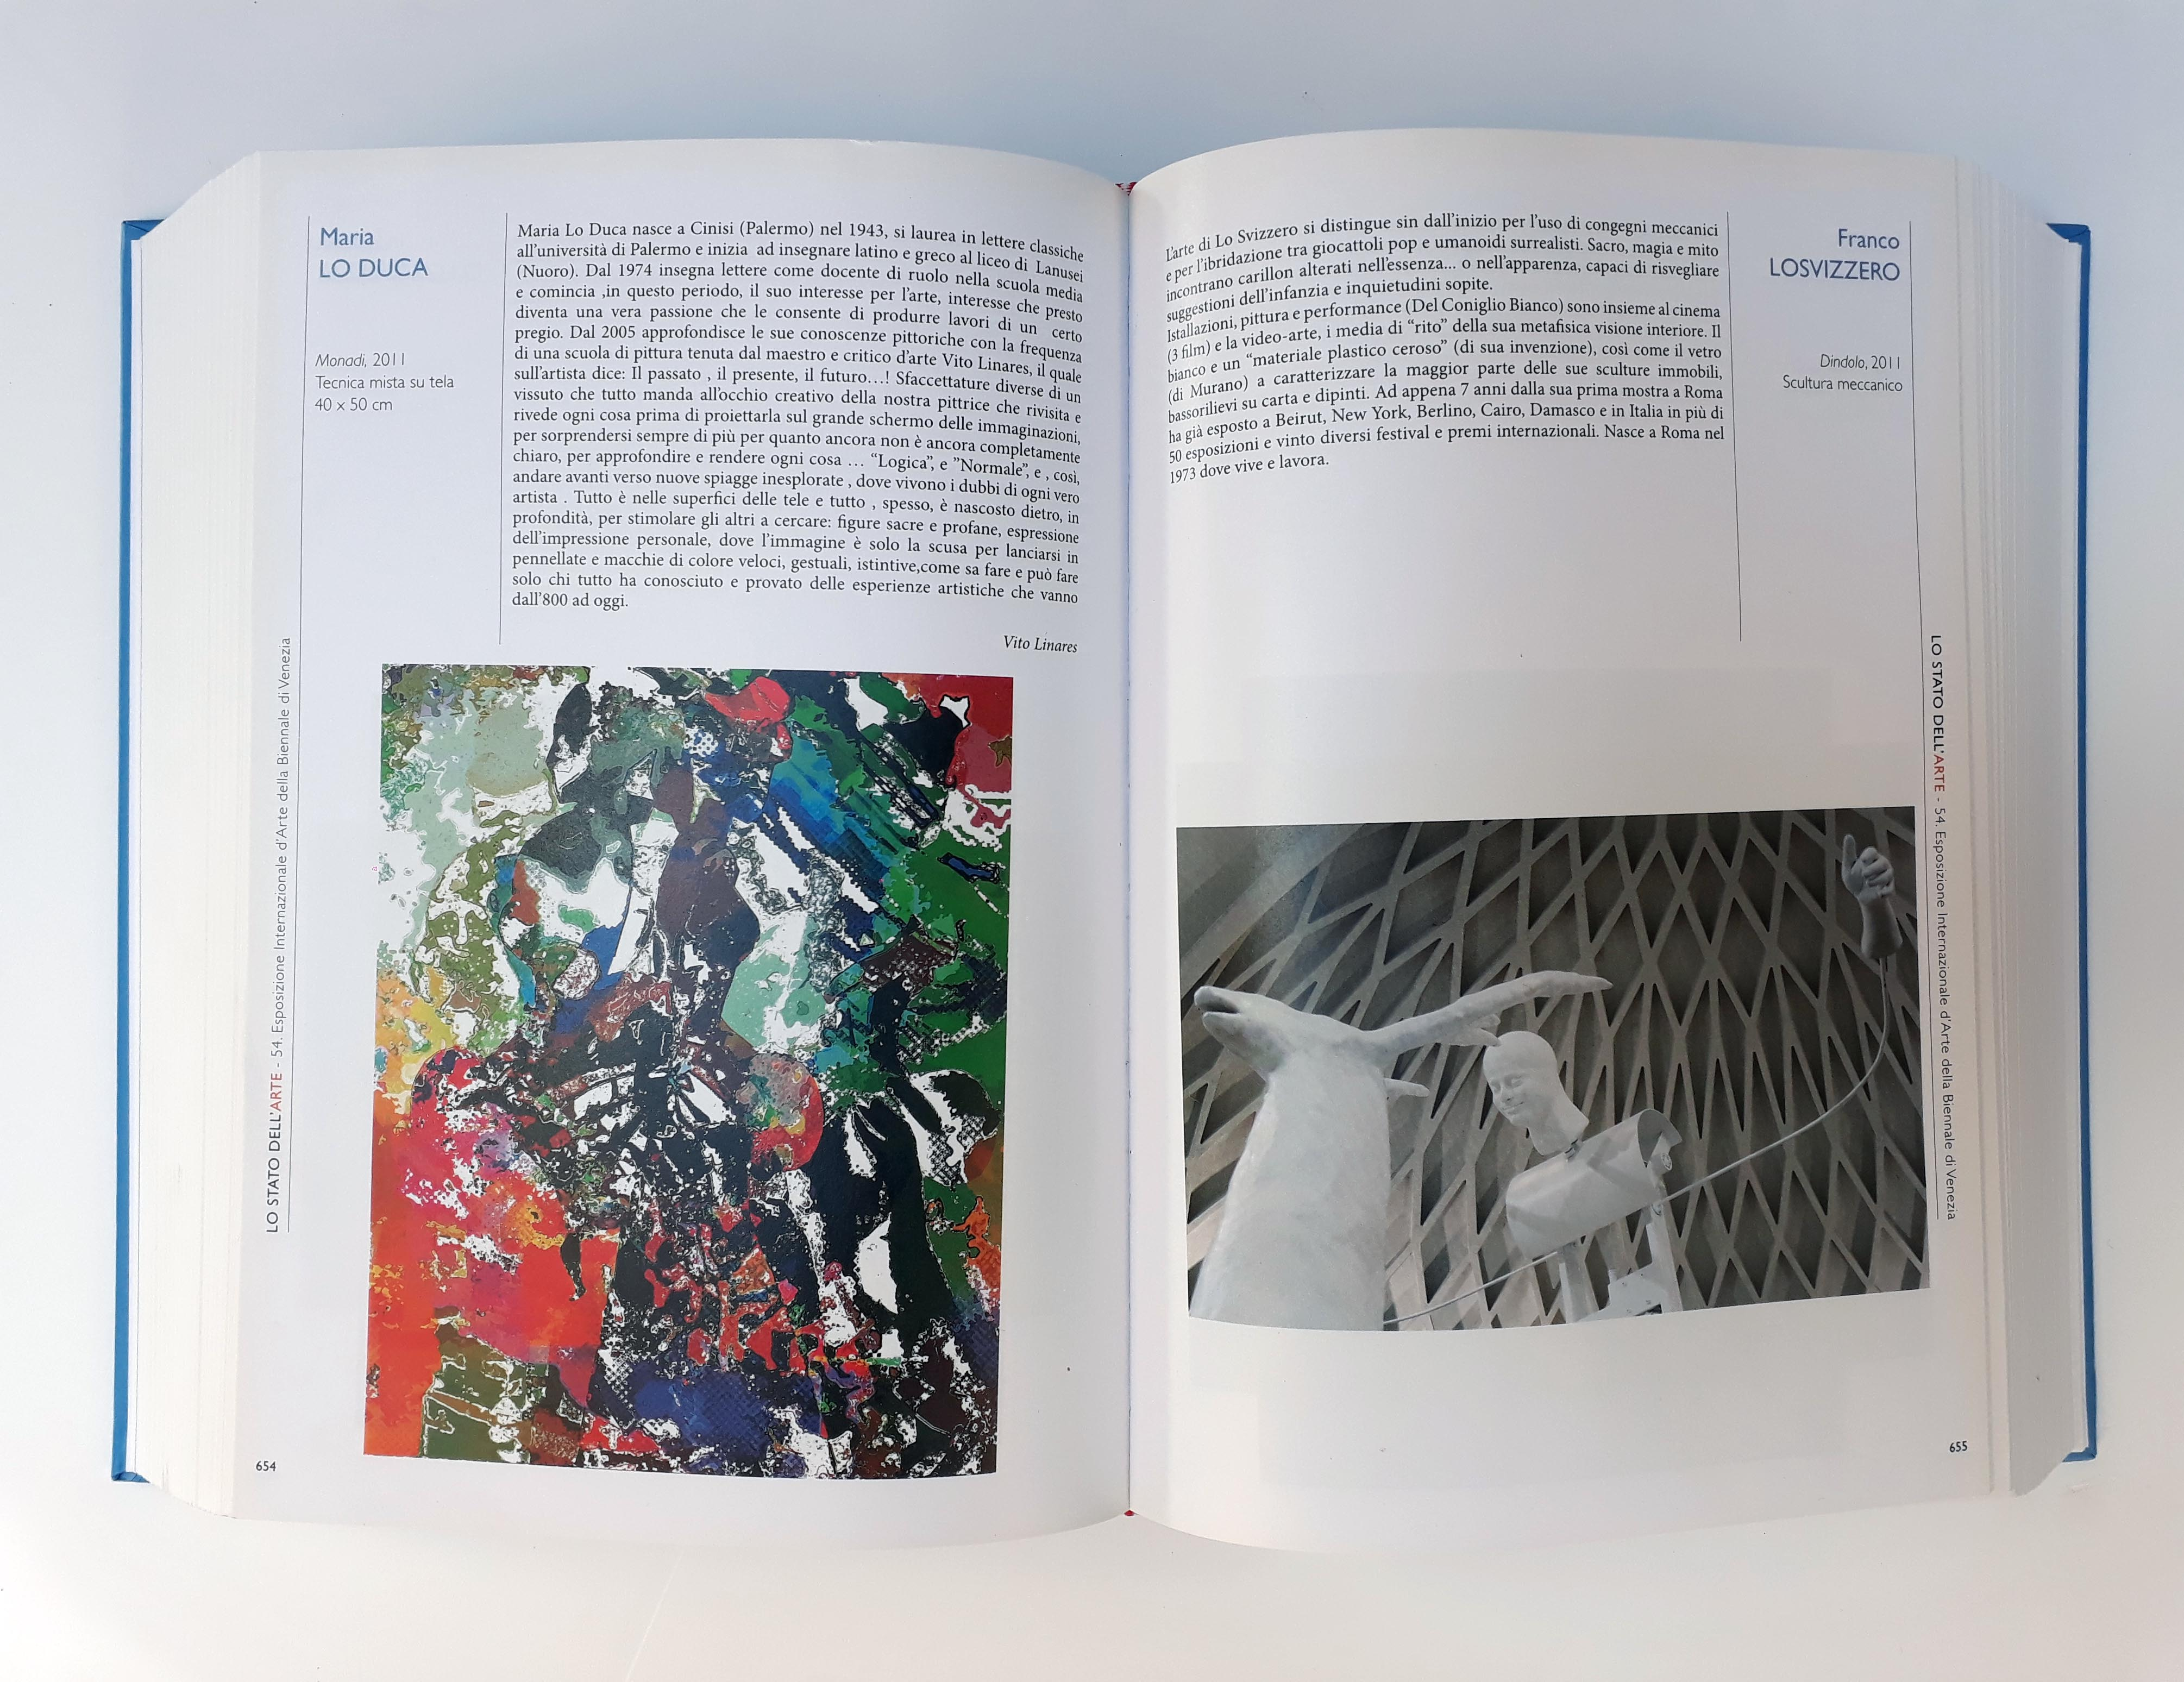 Catalogo a cura di Vittorio Sgarbi